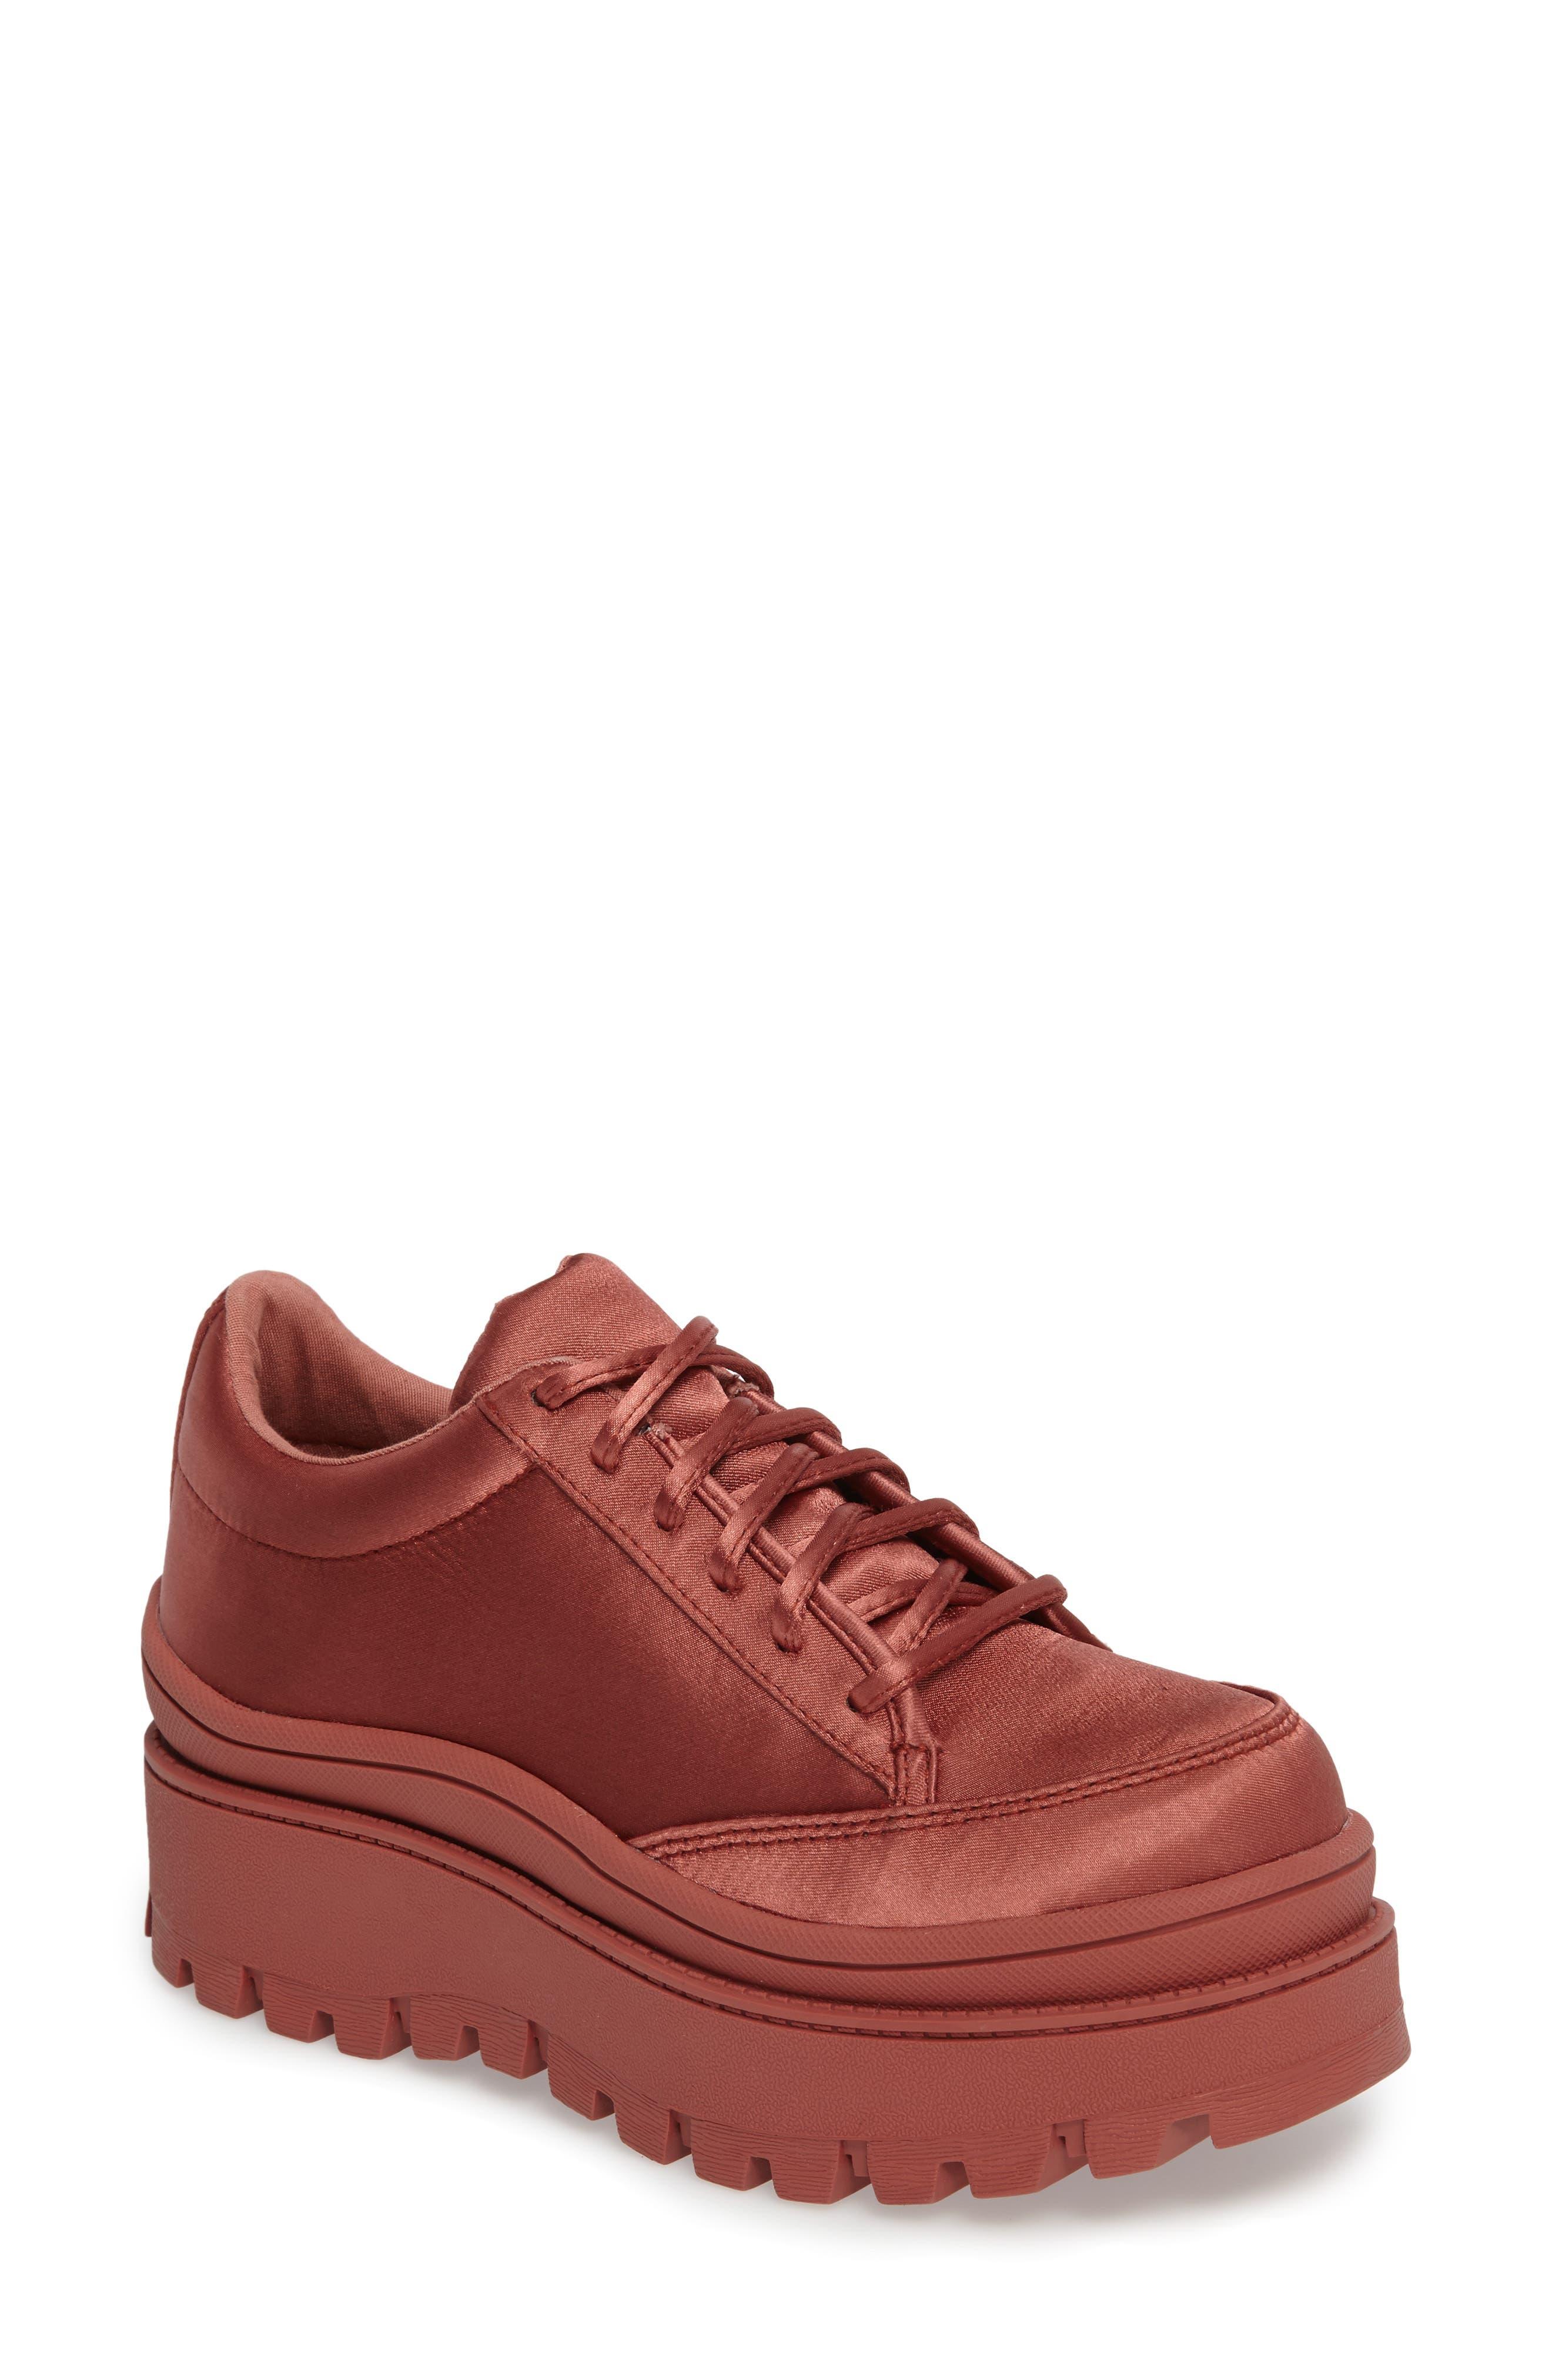 JEFFREY CAMPBELL Top Peak Platform Sneaker